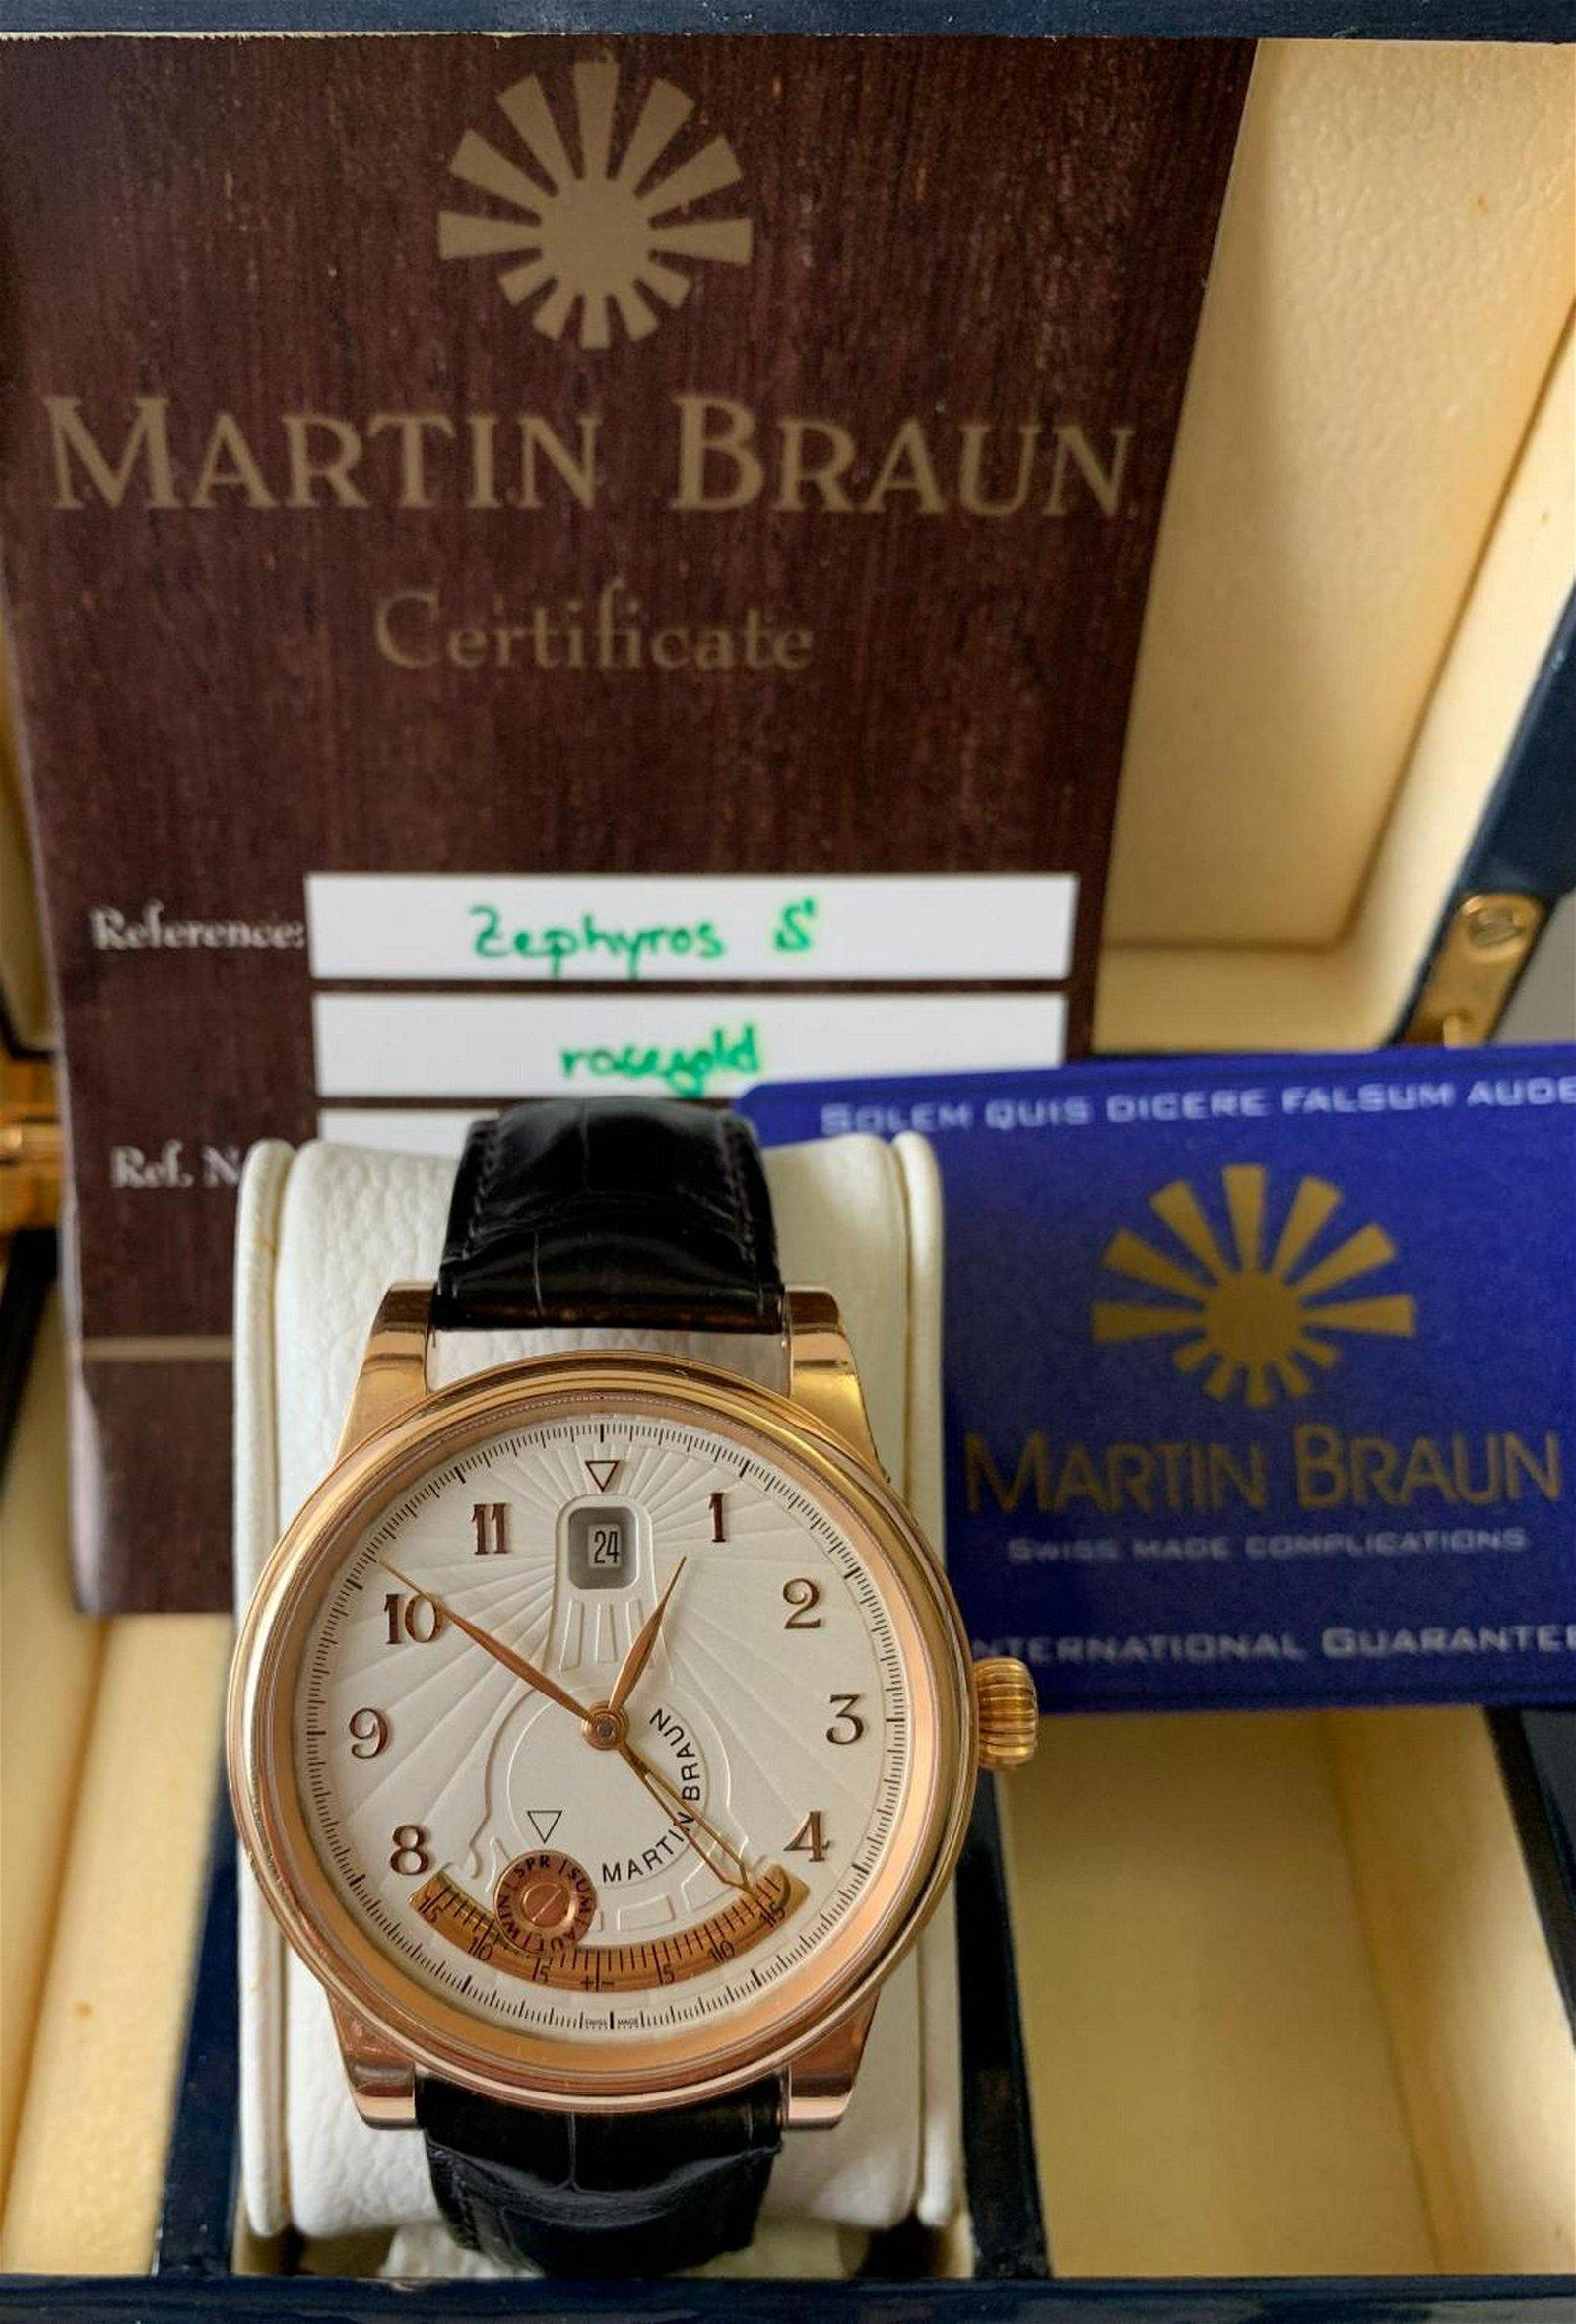 Martin Braun 18KT Rose Gold Zephyros Wristwatch With